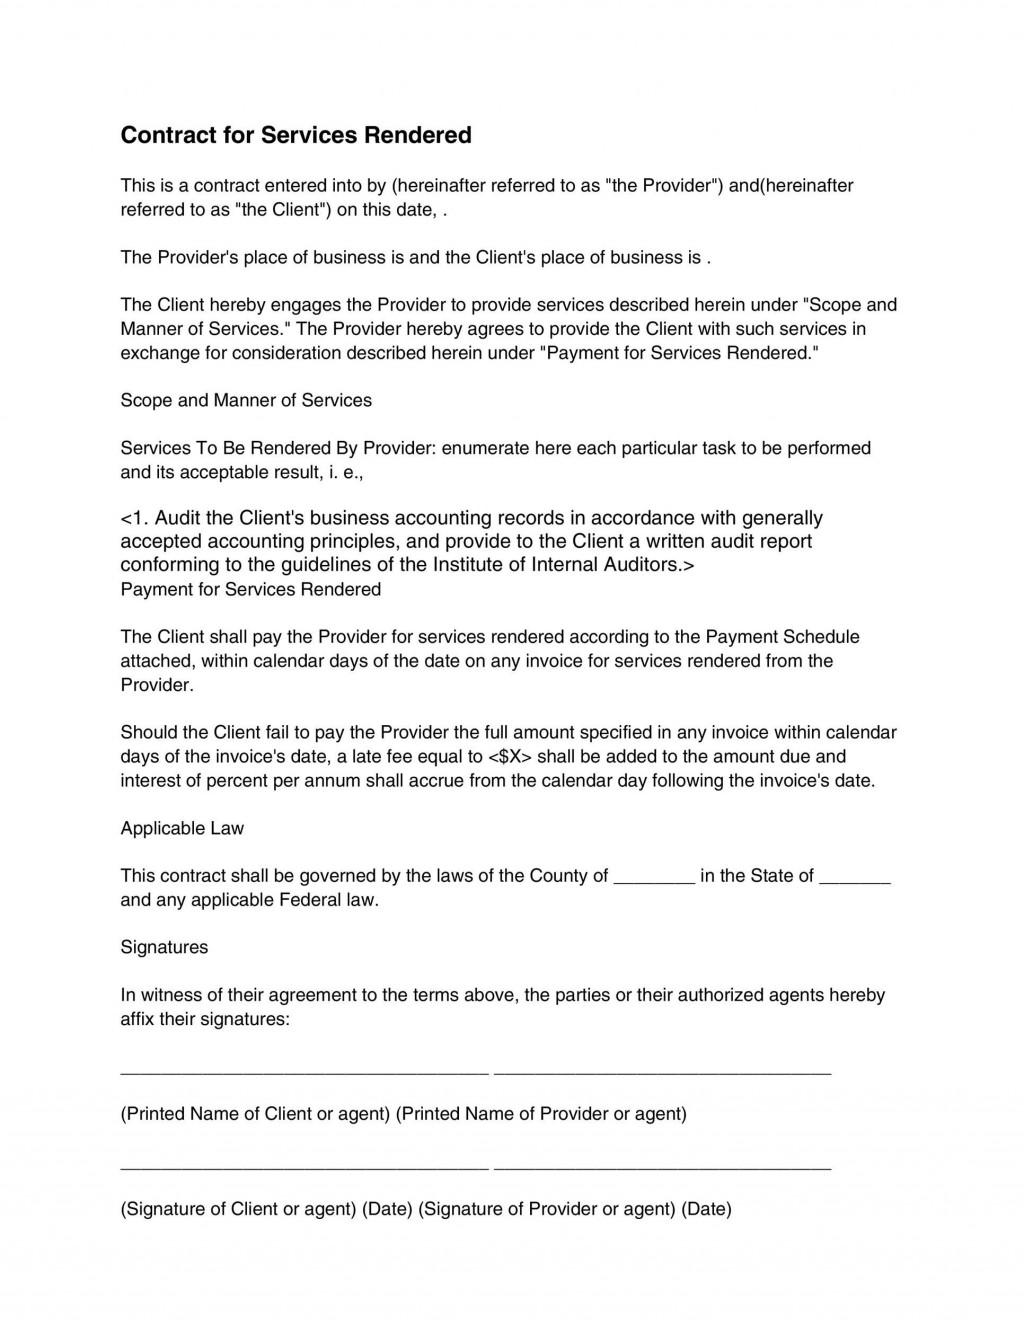 004 Beautiful Legally Binding Contract Template Design  Australia Term 3 Example SampleLarge